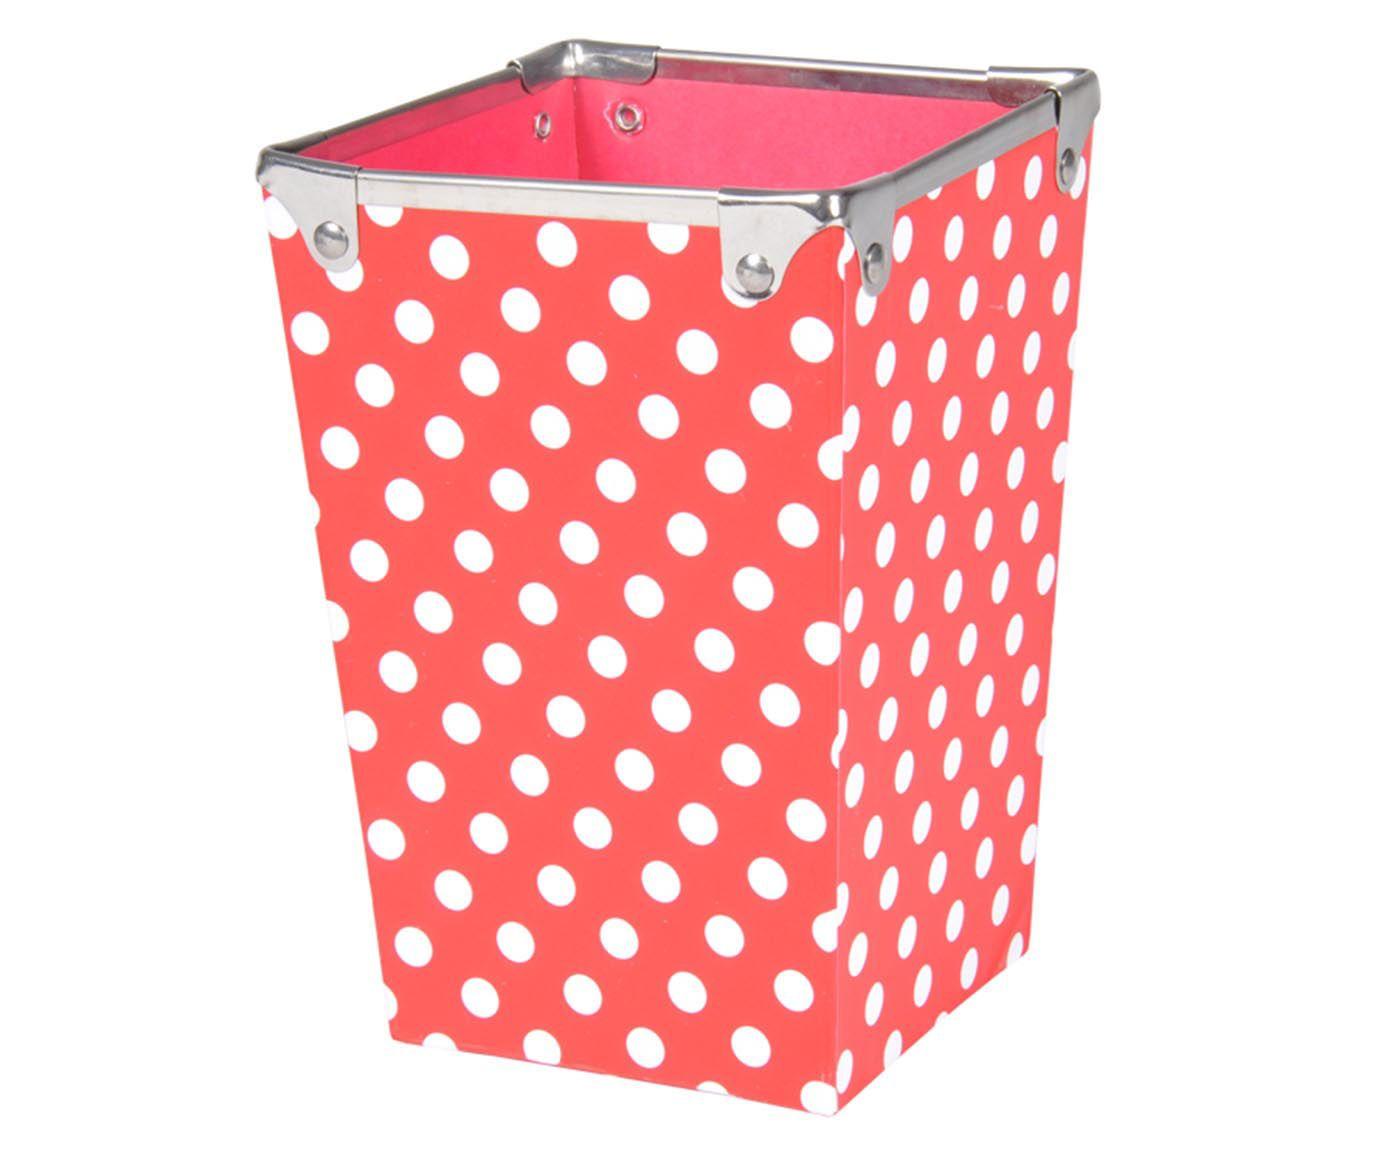 Lixeira Polka Dots | Westwing.com.br